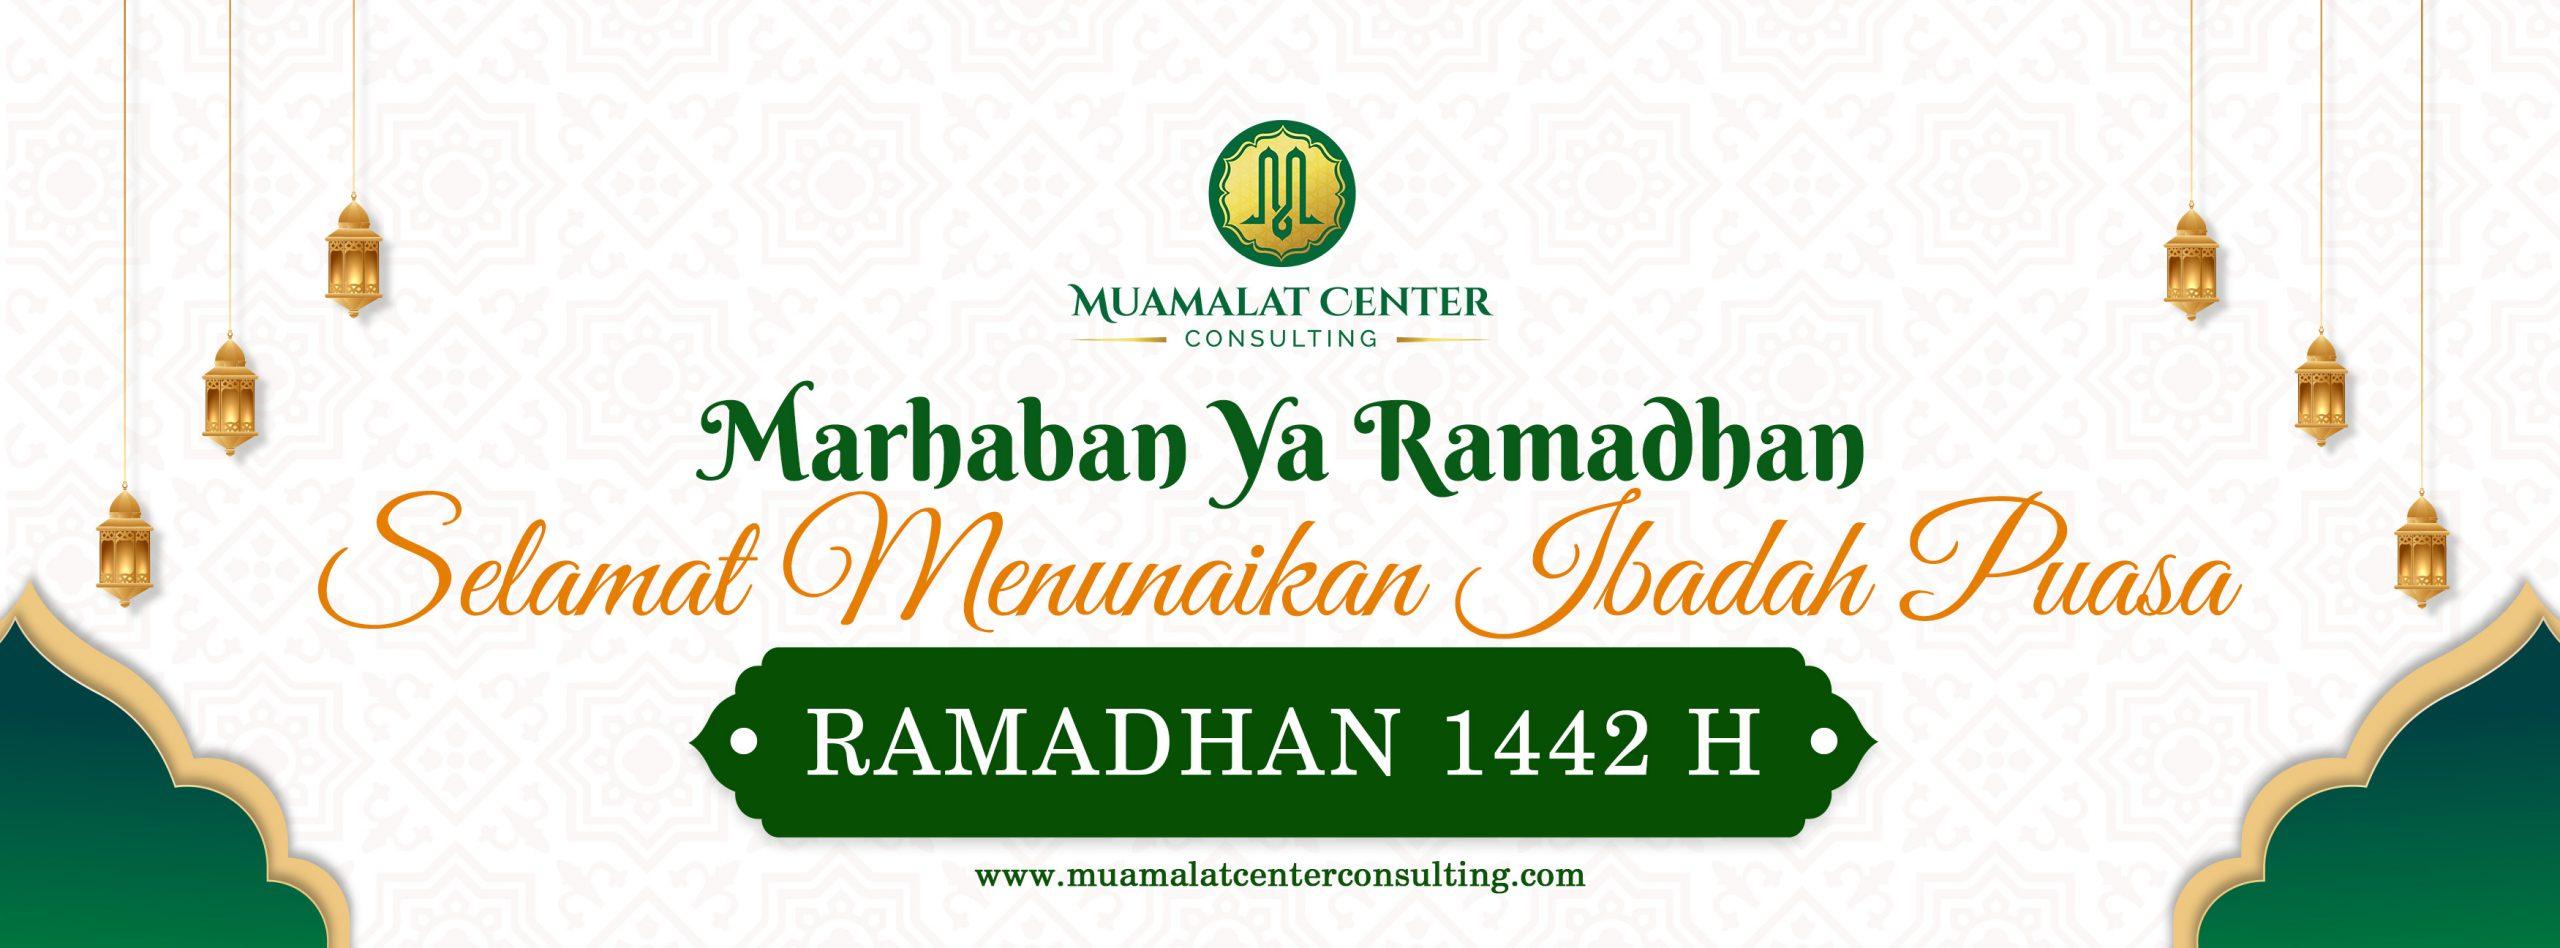 Ramadhan MCC